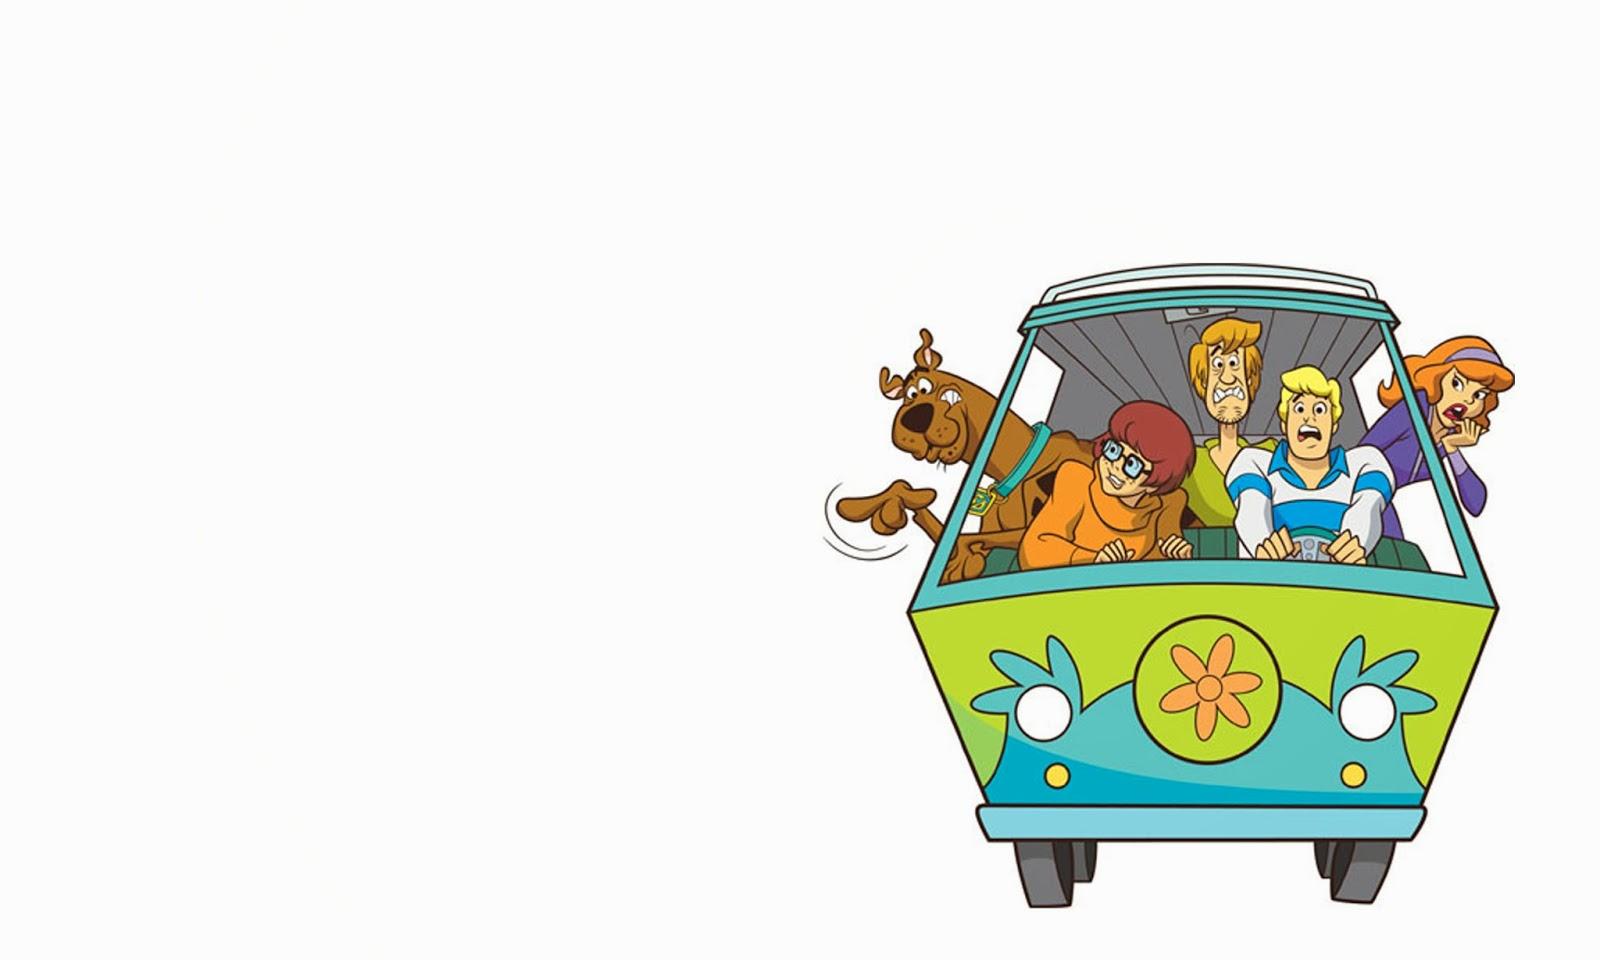 Scooby Doo Widescreen Wallpapers 26501   Baltana 1600x960